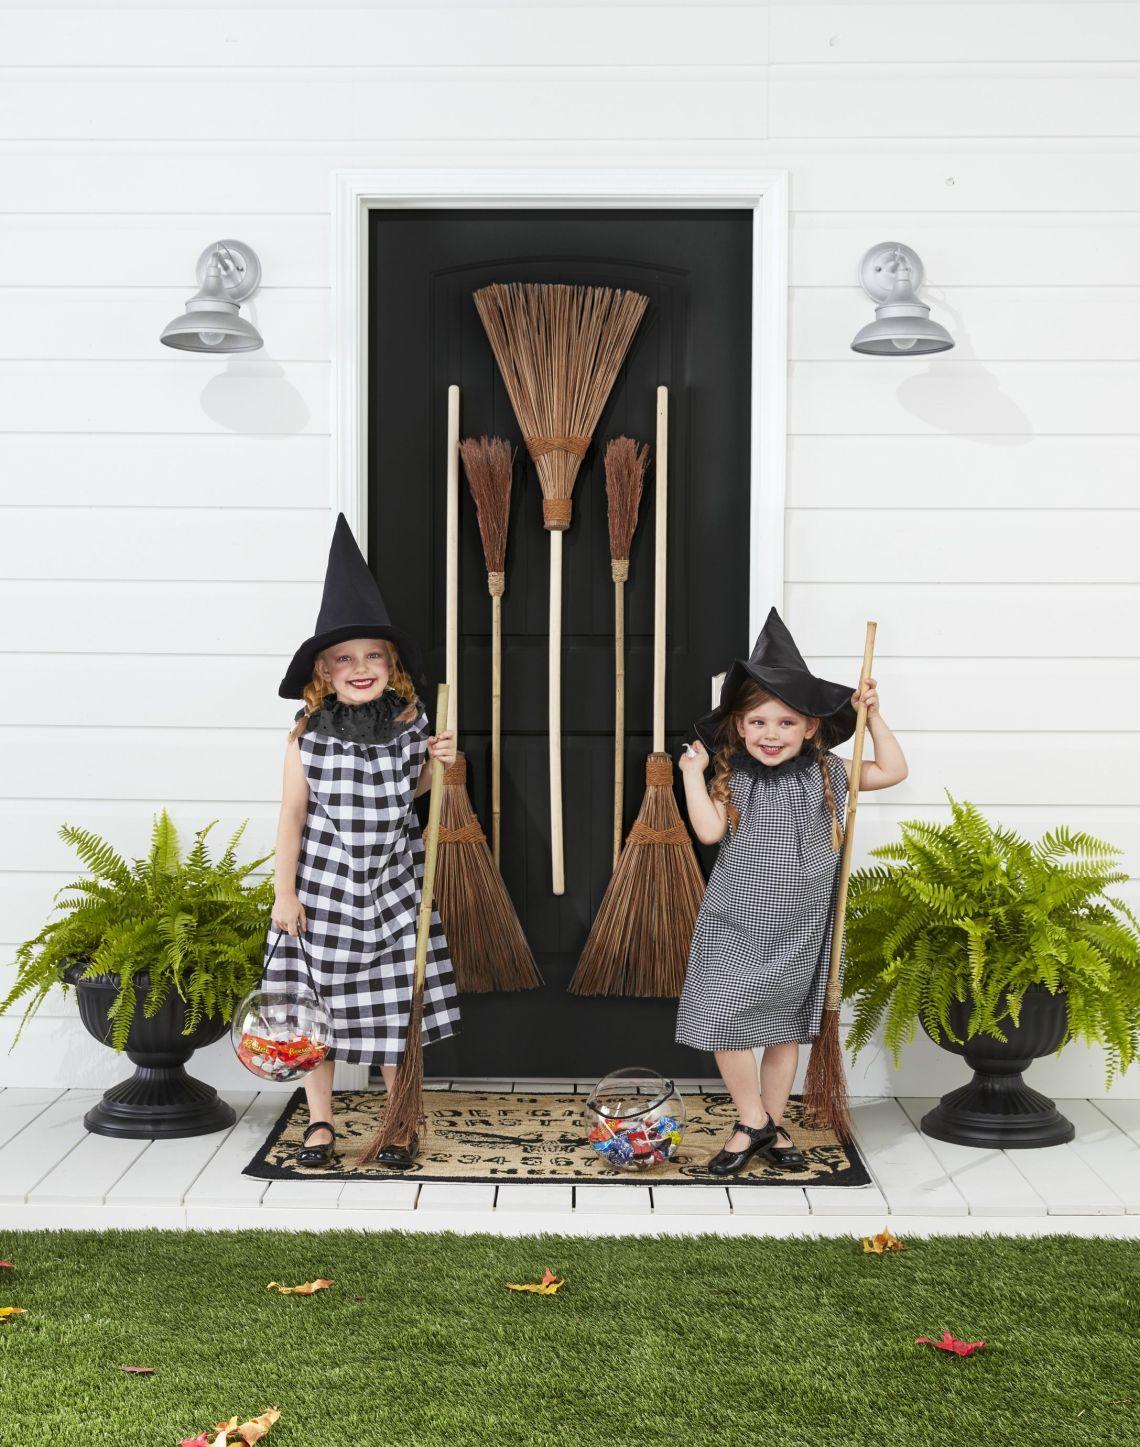 84 Homemade Halloween Costumes For Kids Easy Diy Kids Halloween Costume Ideas 2021